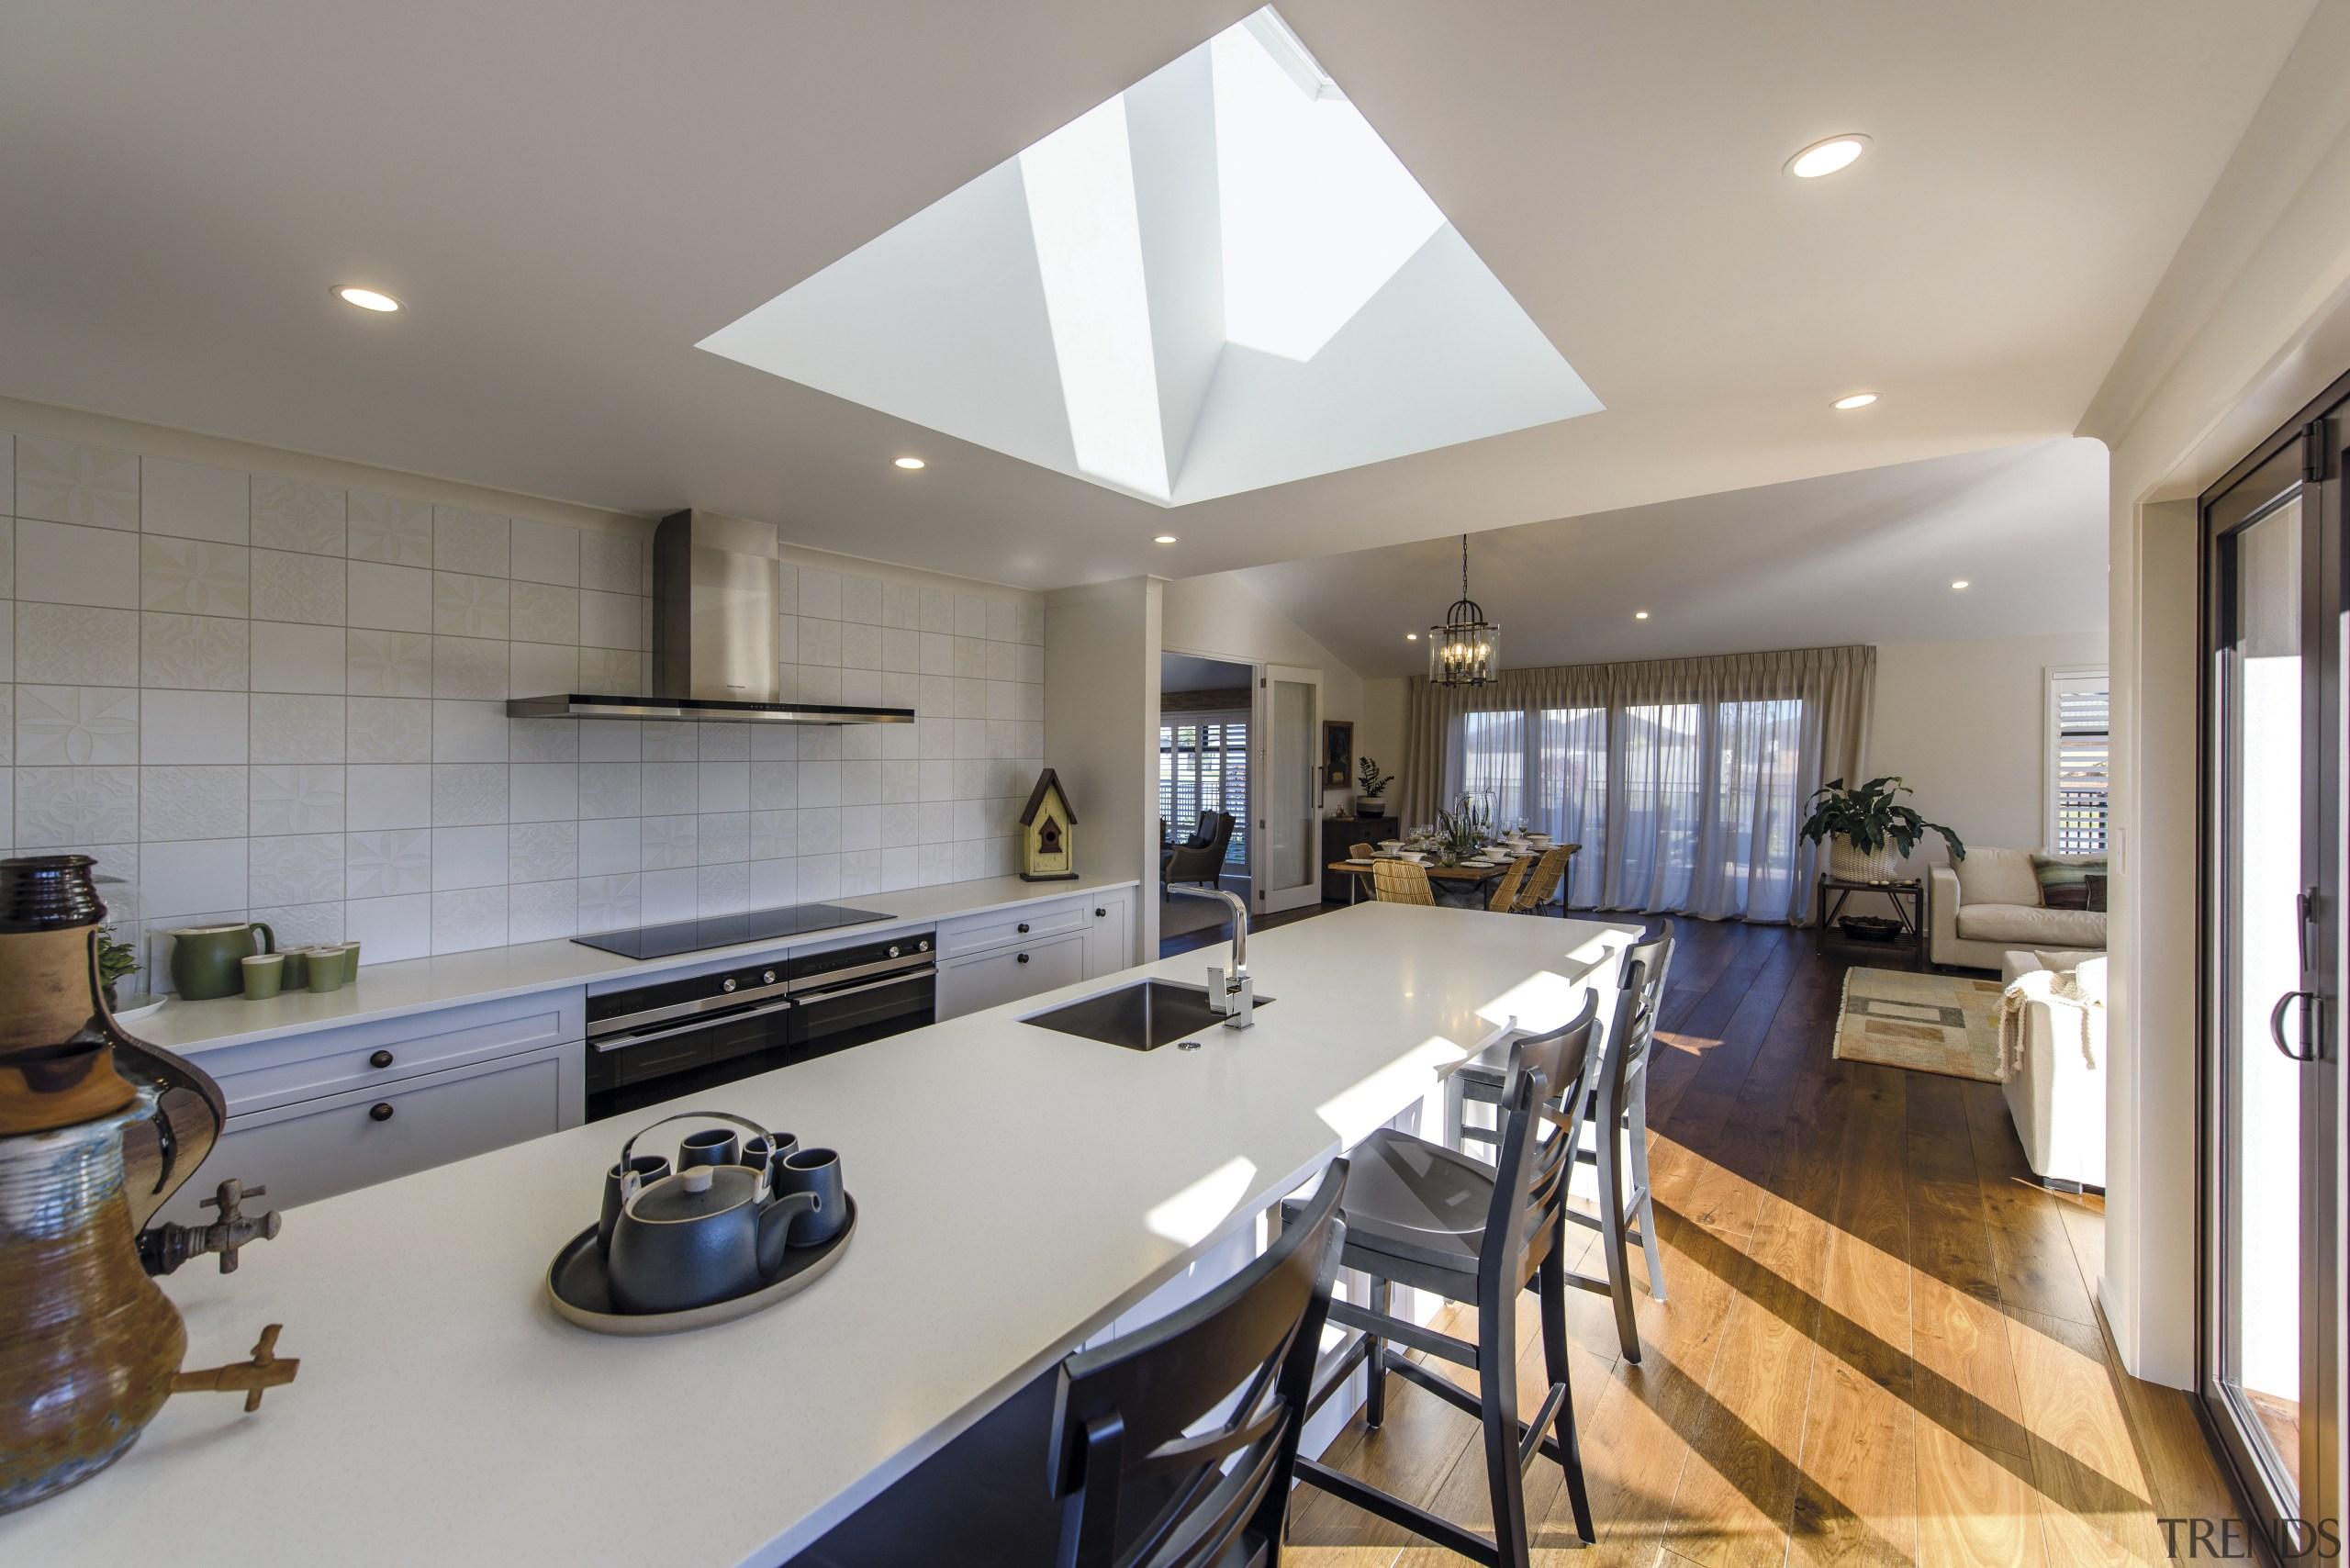 The kitchen in this Tauranga GJ Gardner showhome countertop, interior design, kitchen, real estate, room, gray